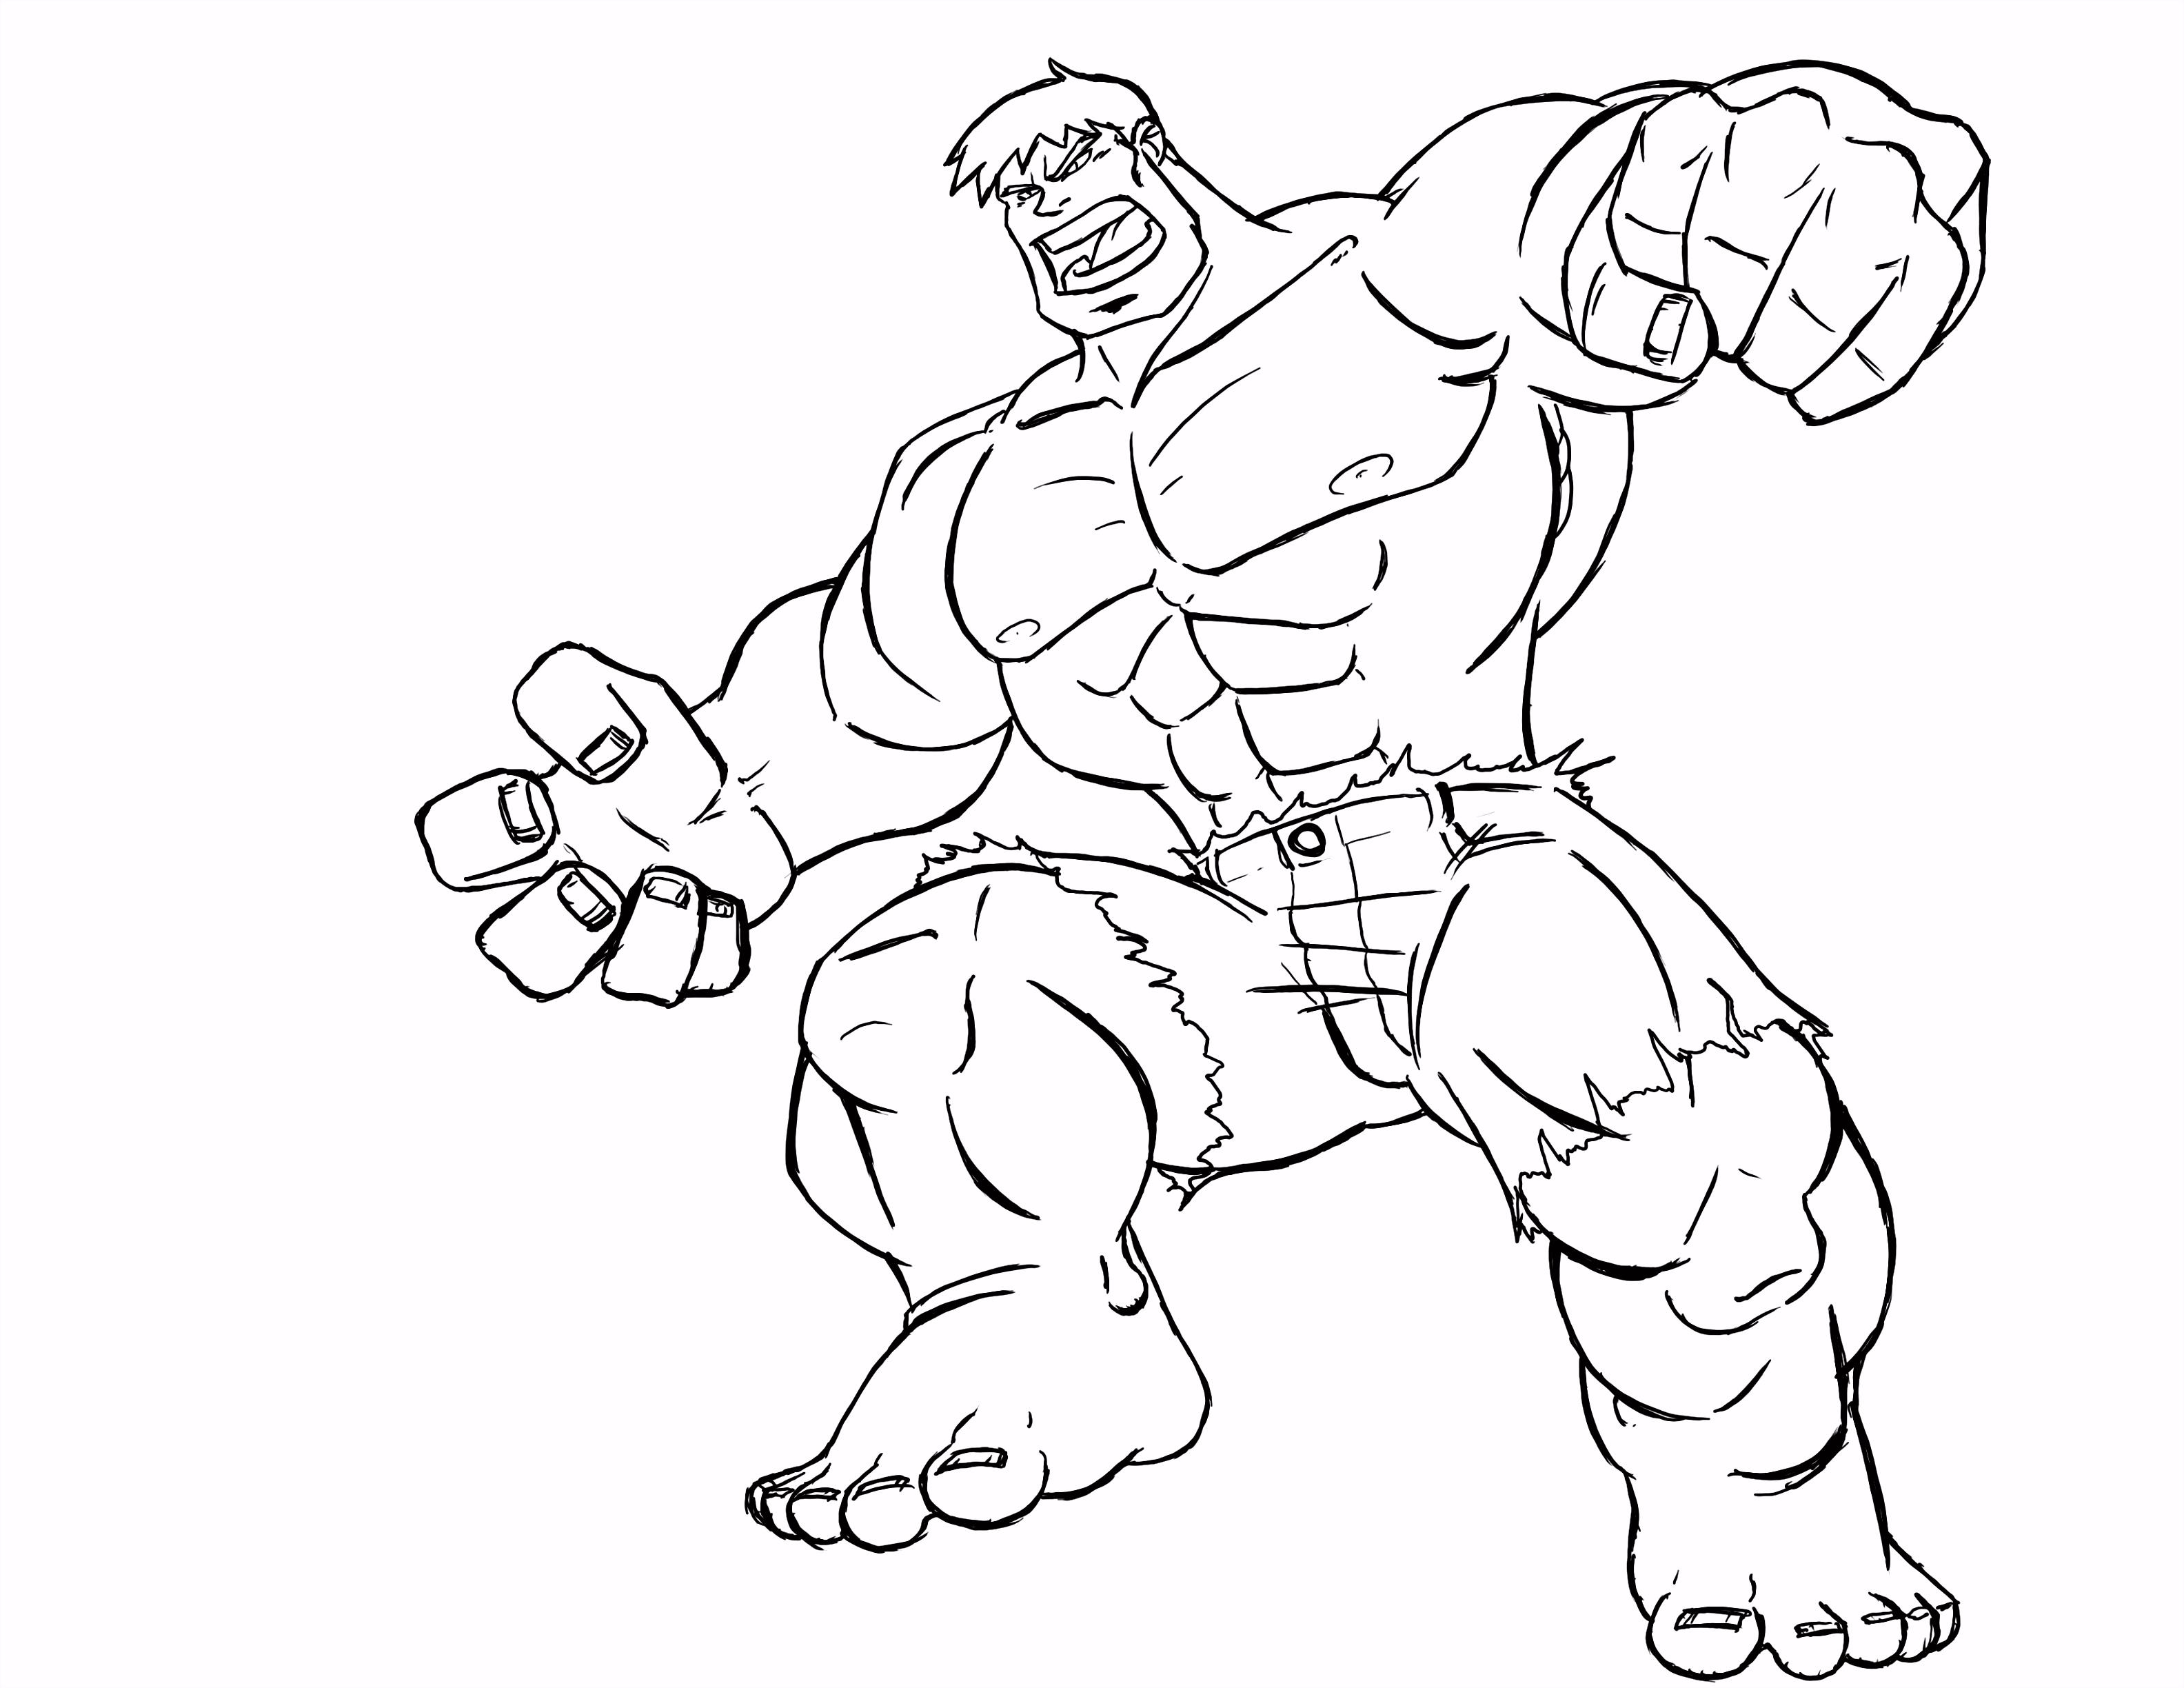 Wallpaper Incredible Hulk Cartoon Drawing aiden